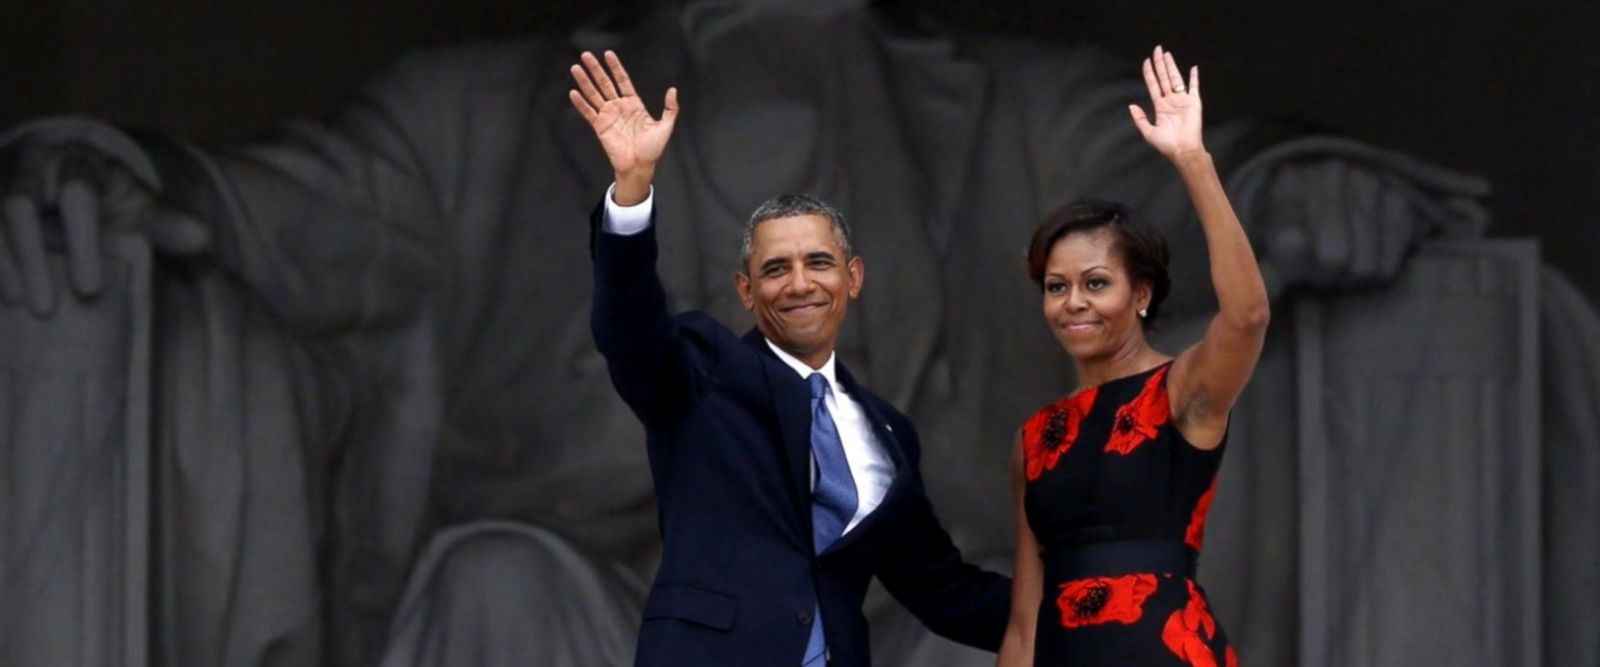 VIDEO: ABC Stars Look Back on Obama's Presidency